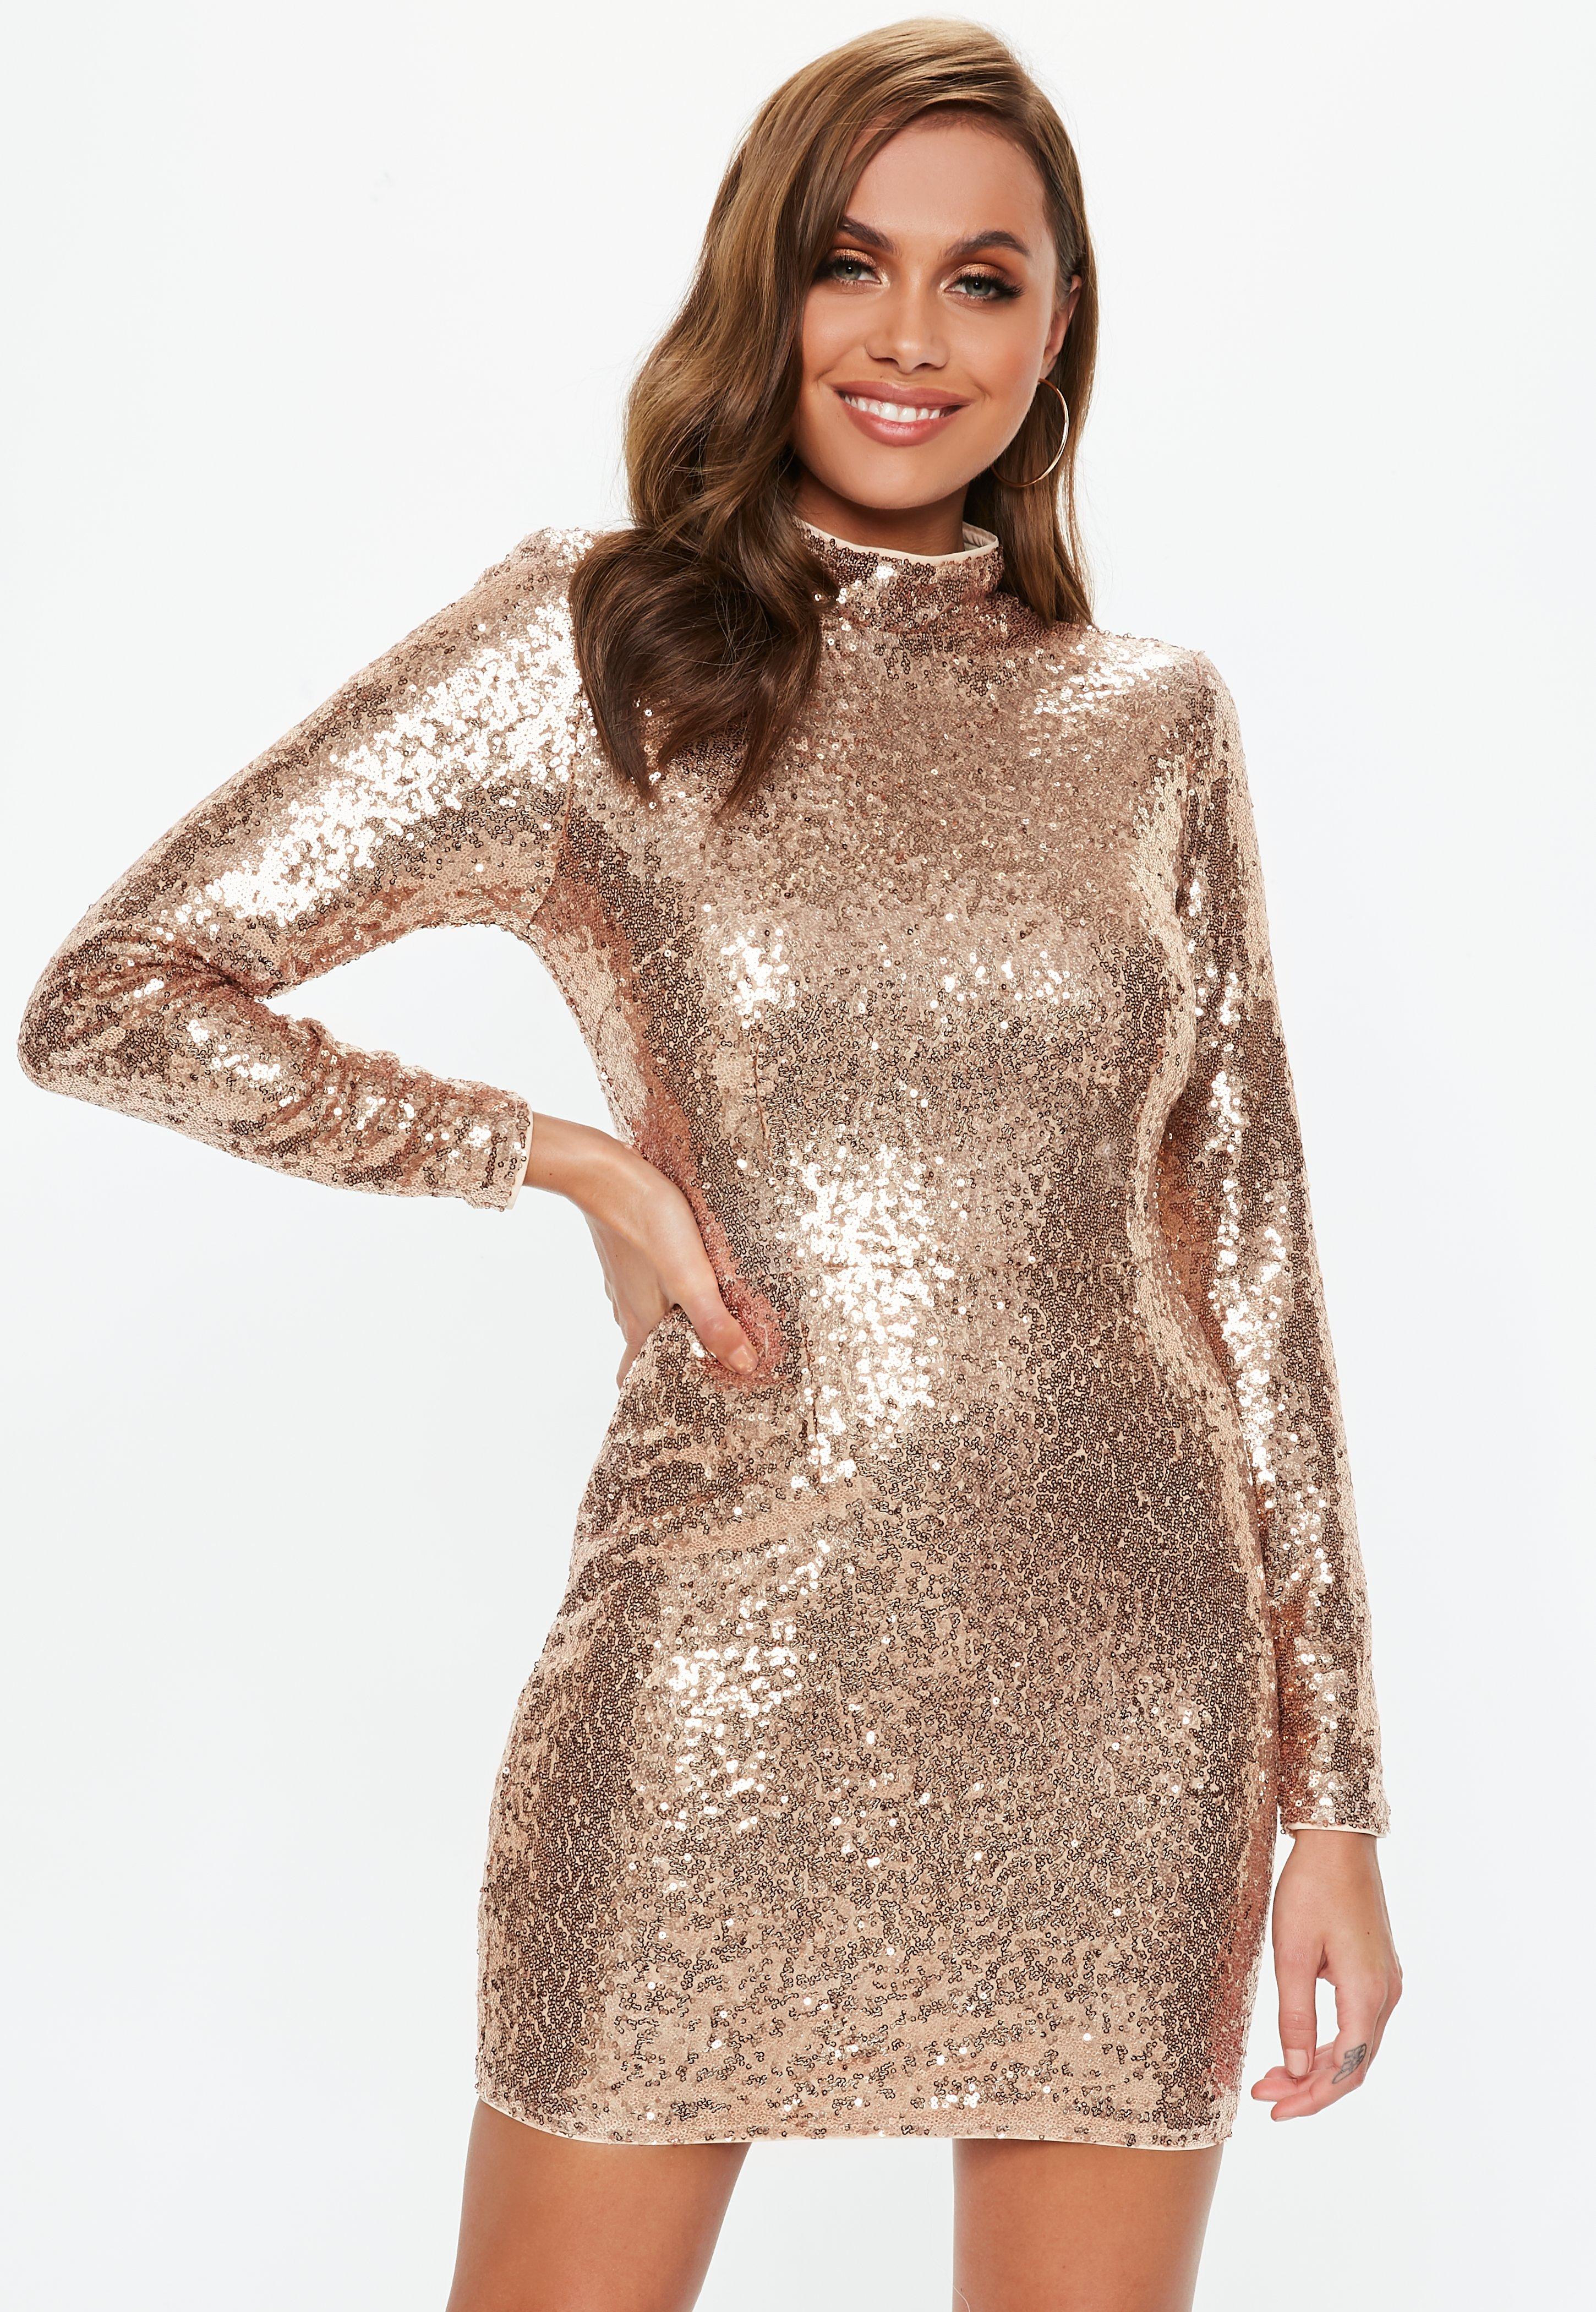 985a3aba37 Sequin Dresses